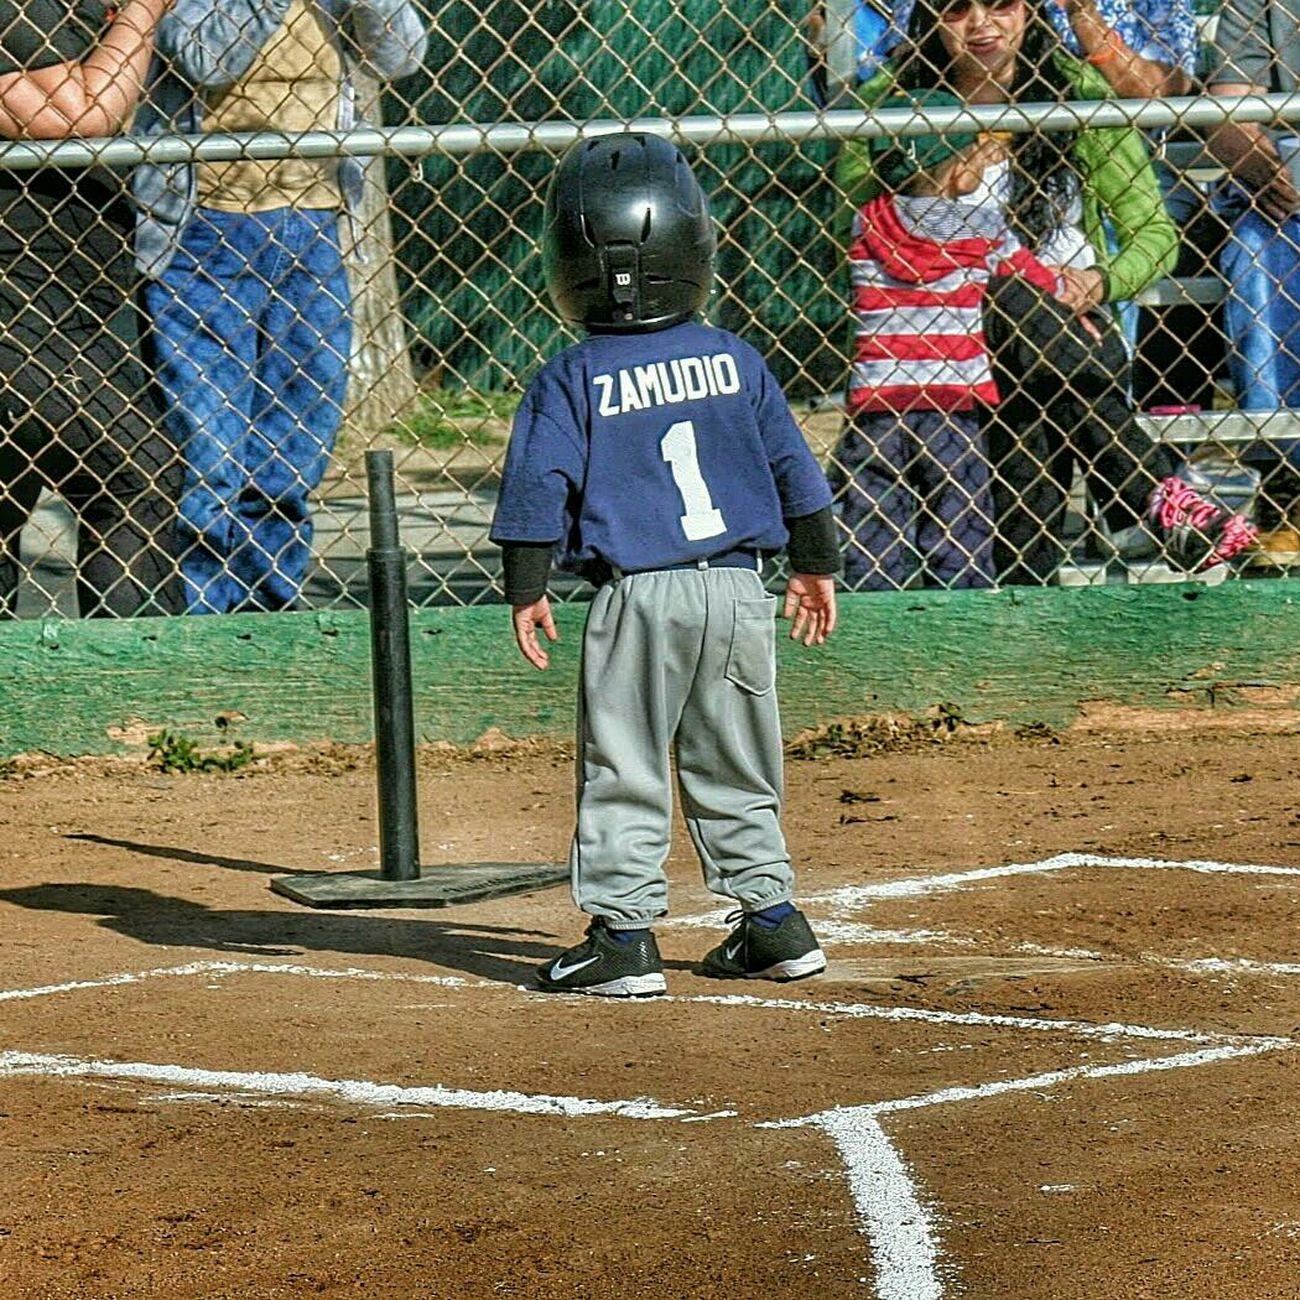 SCORED! North East Santa Ana Little League Little League Baseball NESALL Zamudio